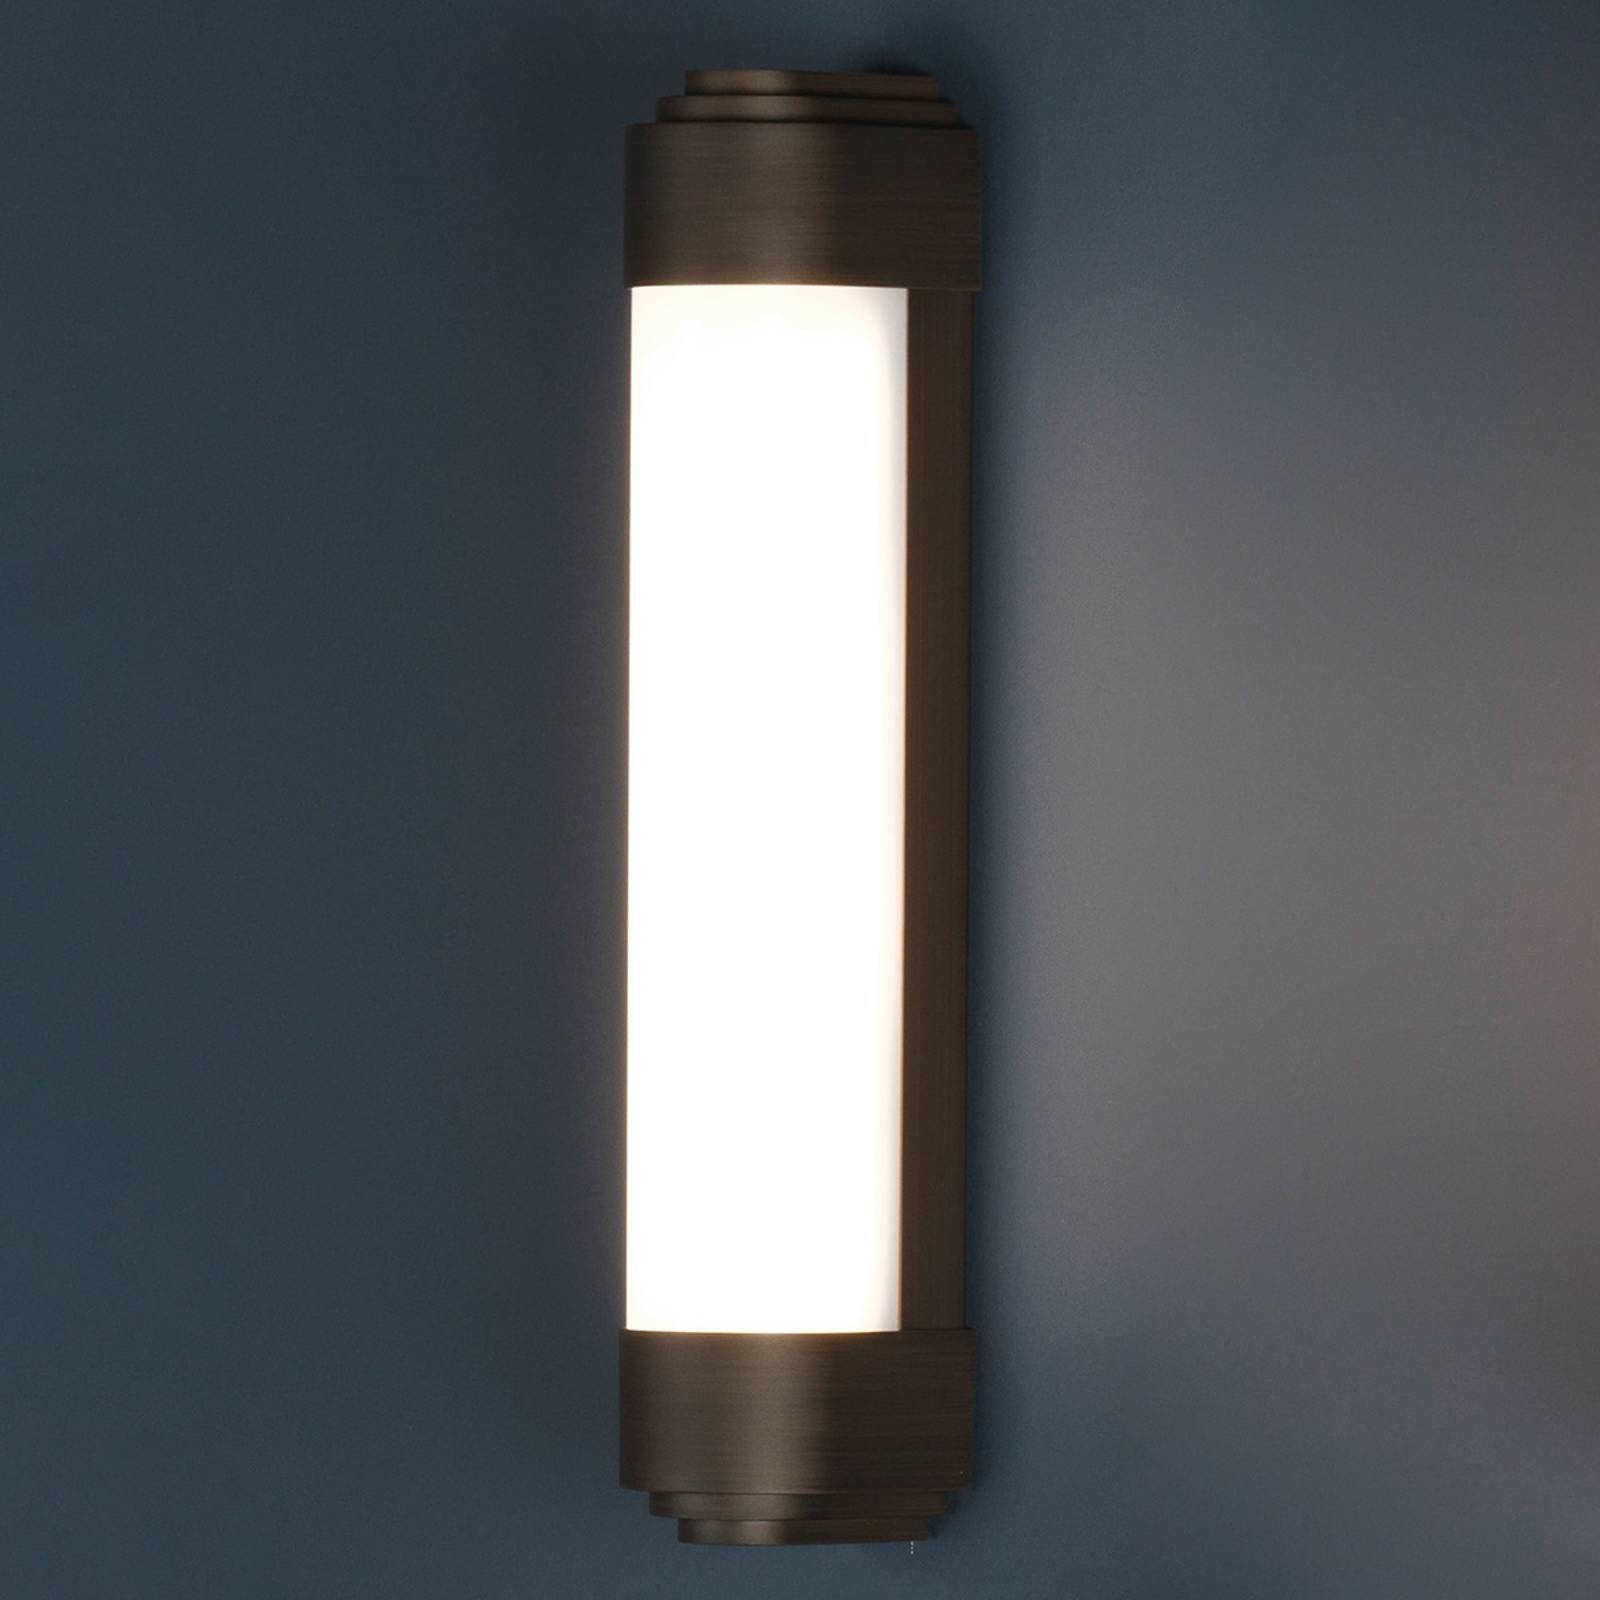 Astro Belgravia LED-vegglampe, 40 cm